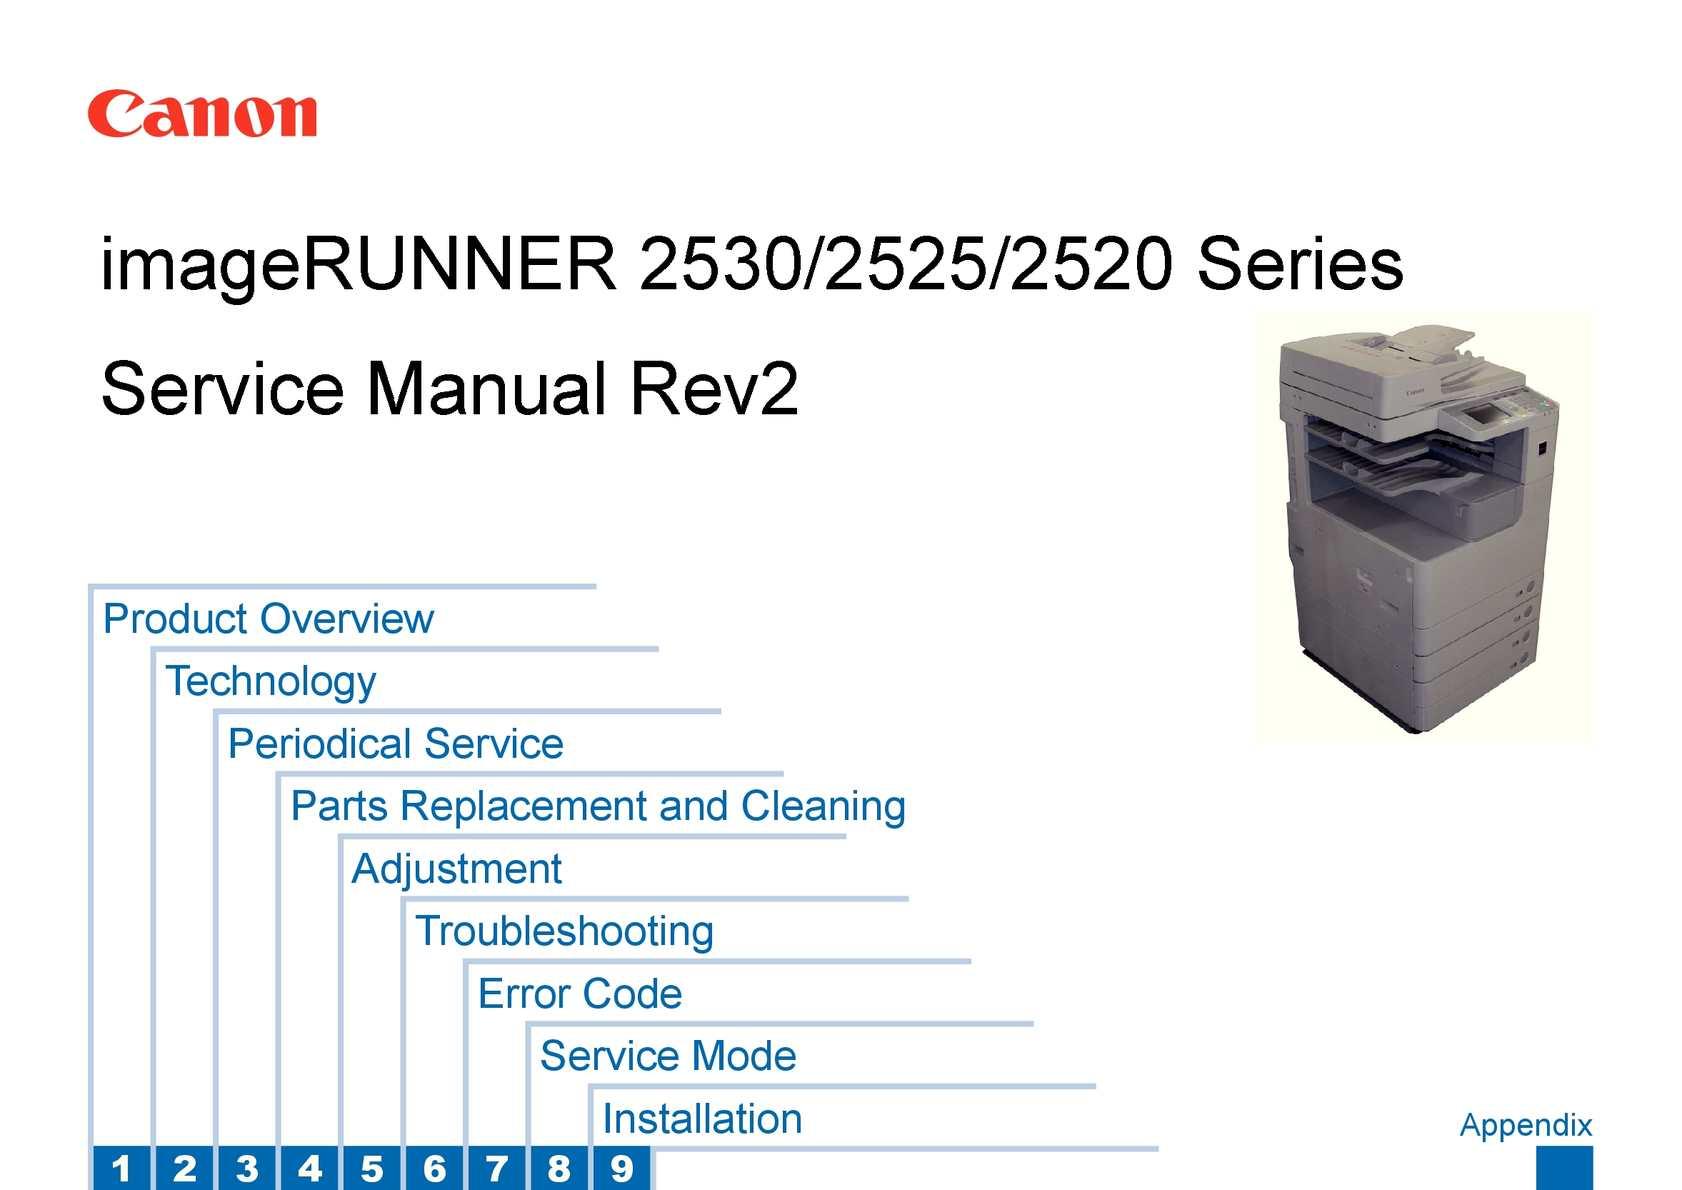 canon photocopier service manual basic instruction manual u2022 rh ryanshtuff co Canon Copy Machine Manual Canon Printer Manuals PDF